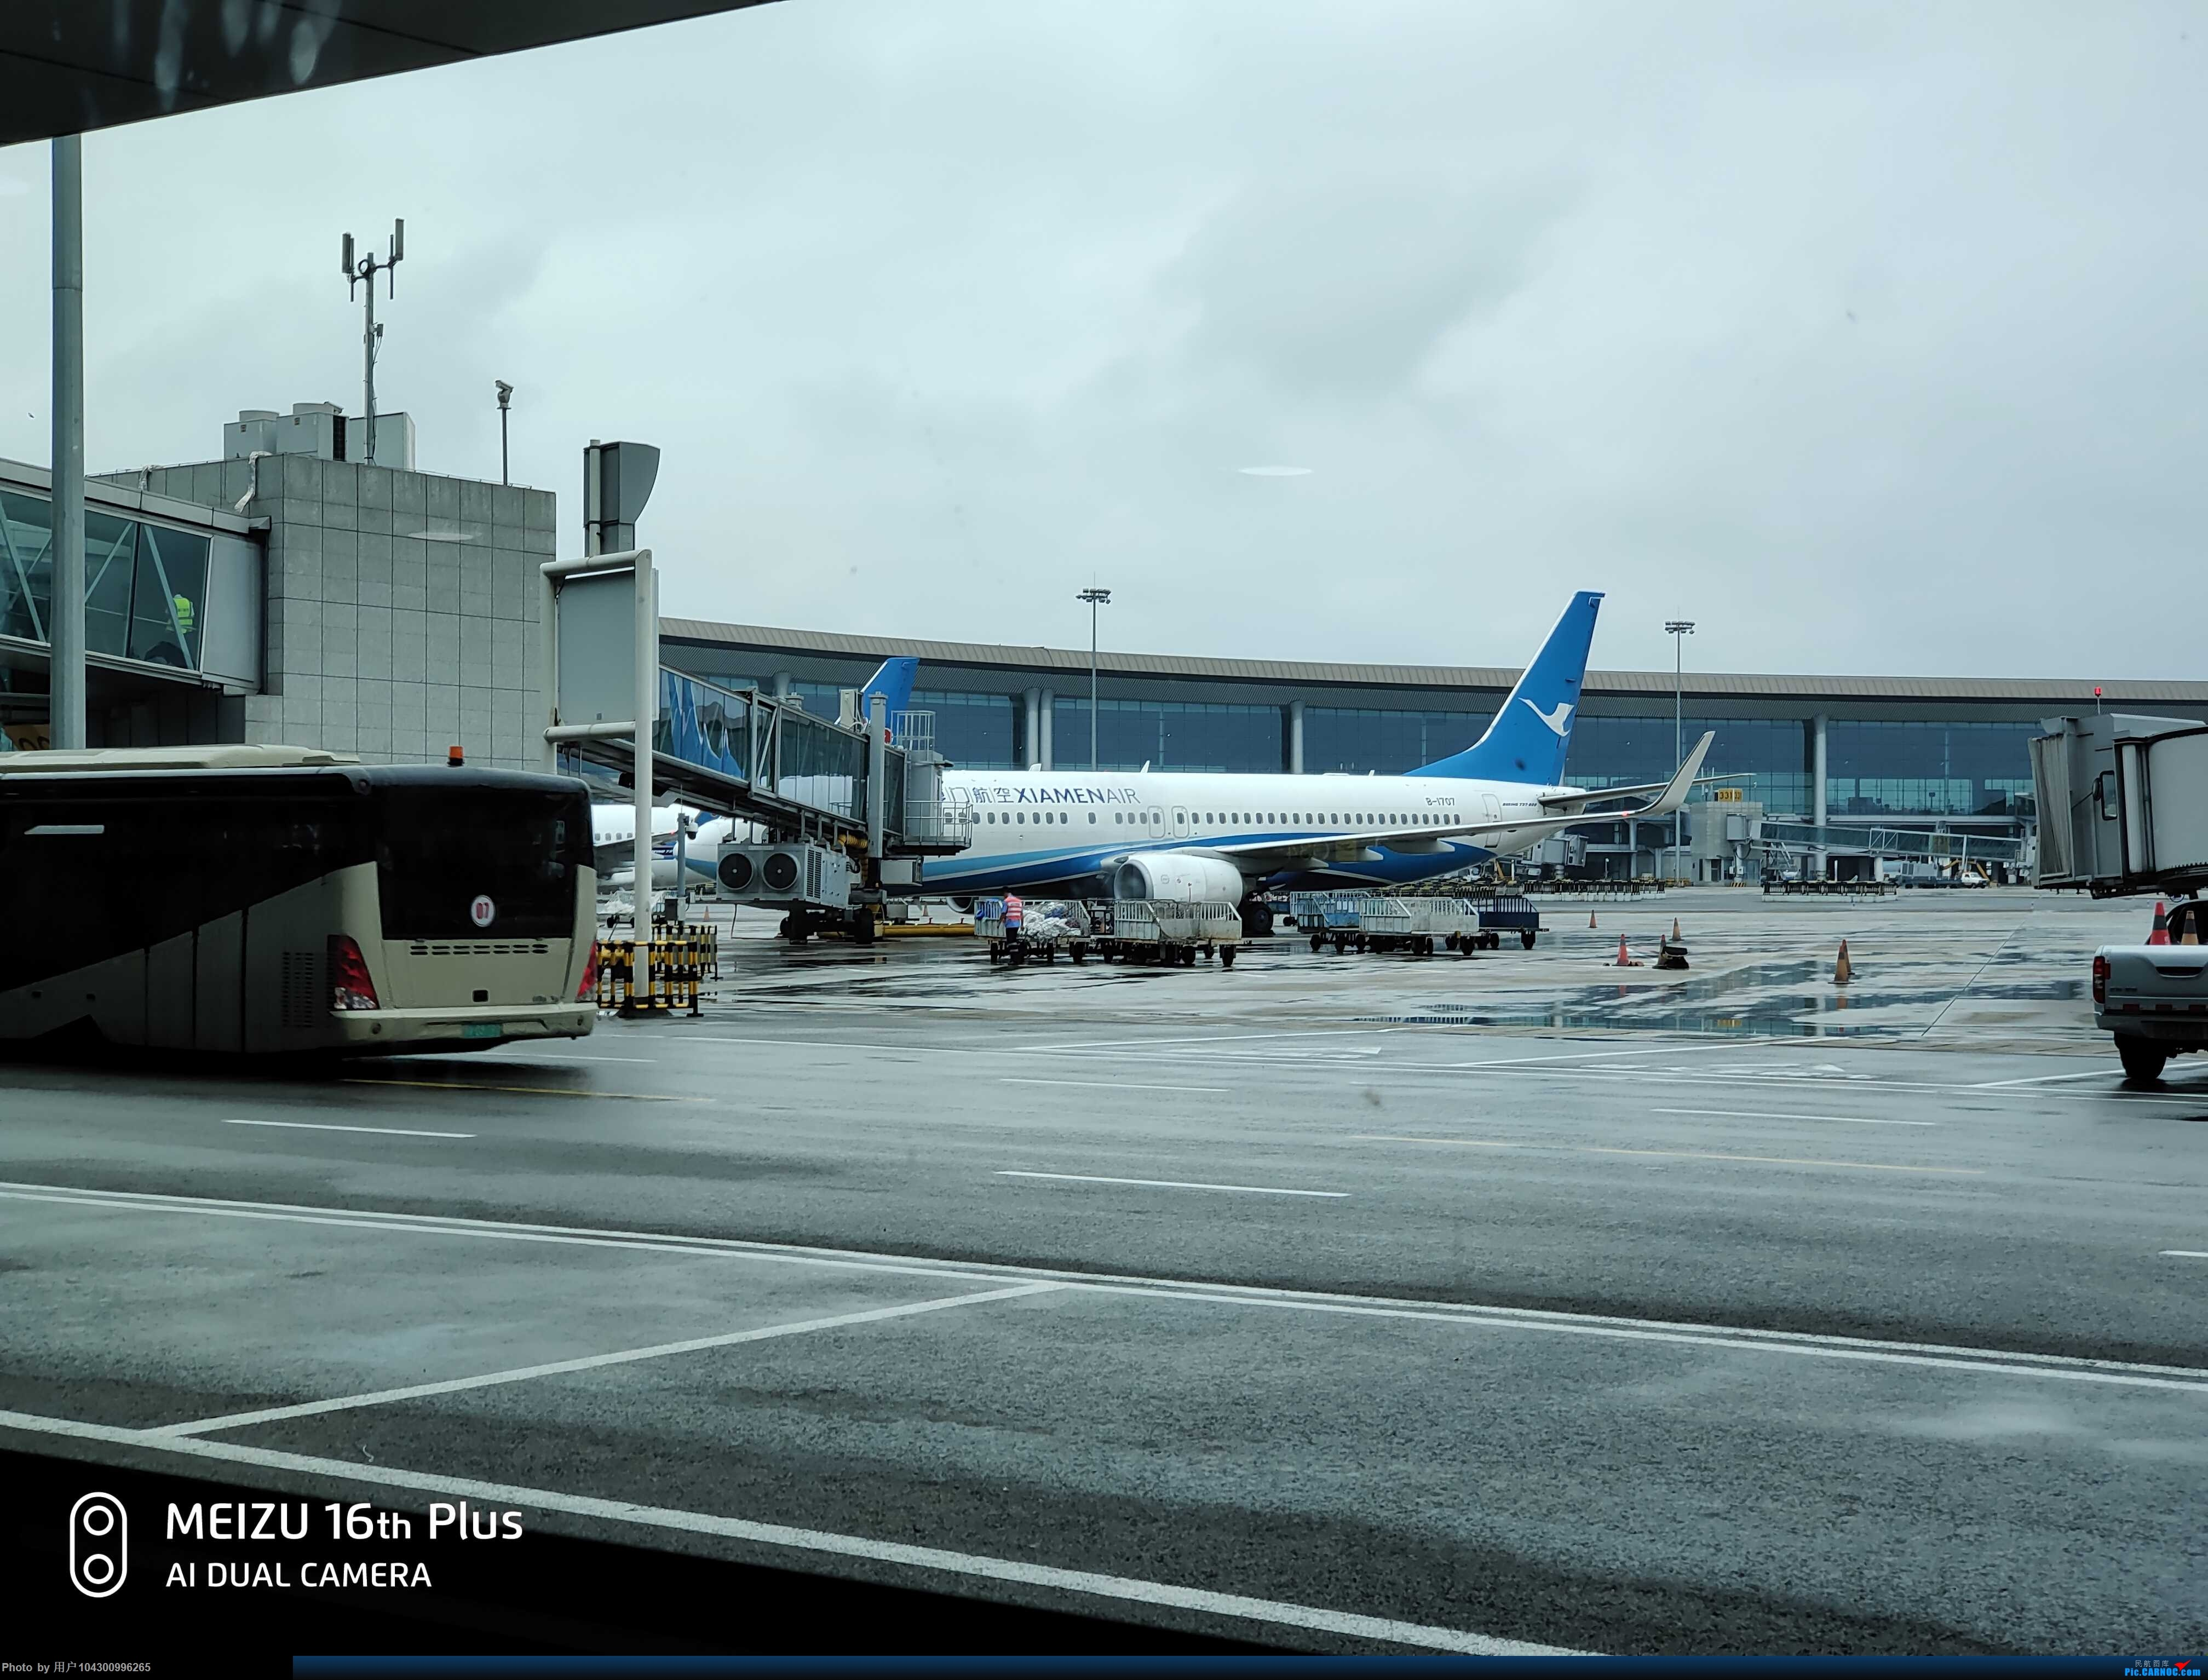 Re:[原创]〖DM哥游记〗多彩贵州航空~重庆--贵阳 BOEING 737-800 B-1707 中国重庆江北国际机场